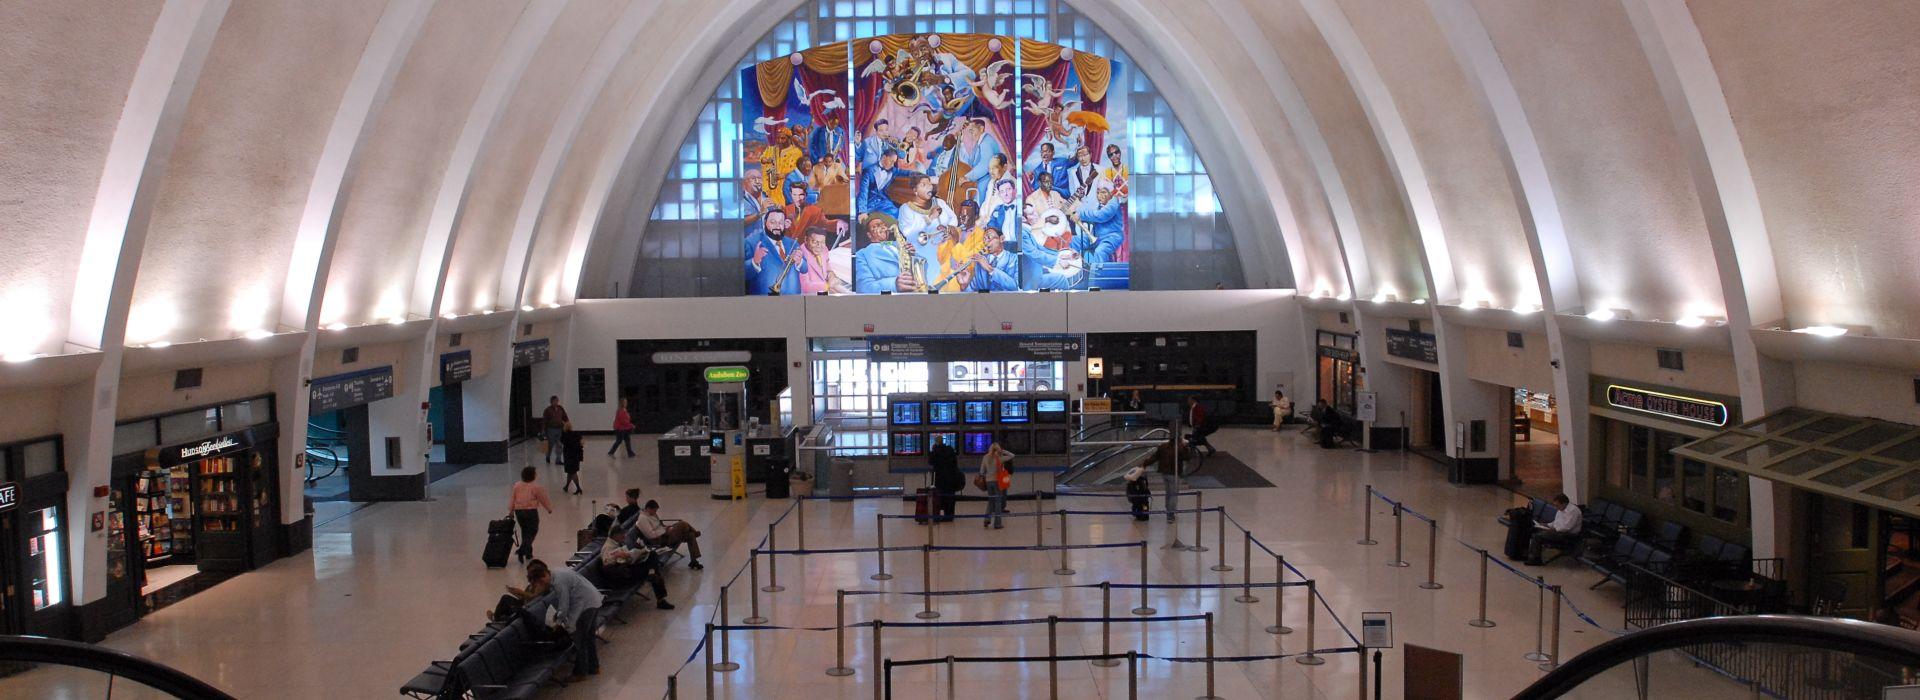 New Orleans International Airport